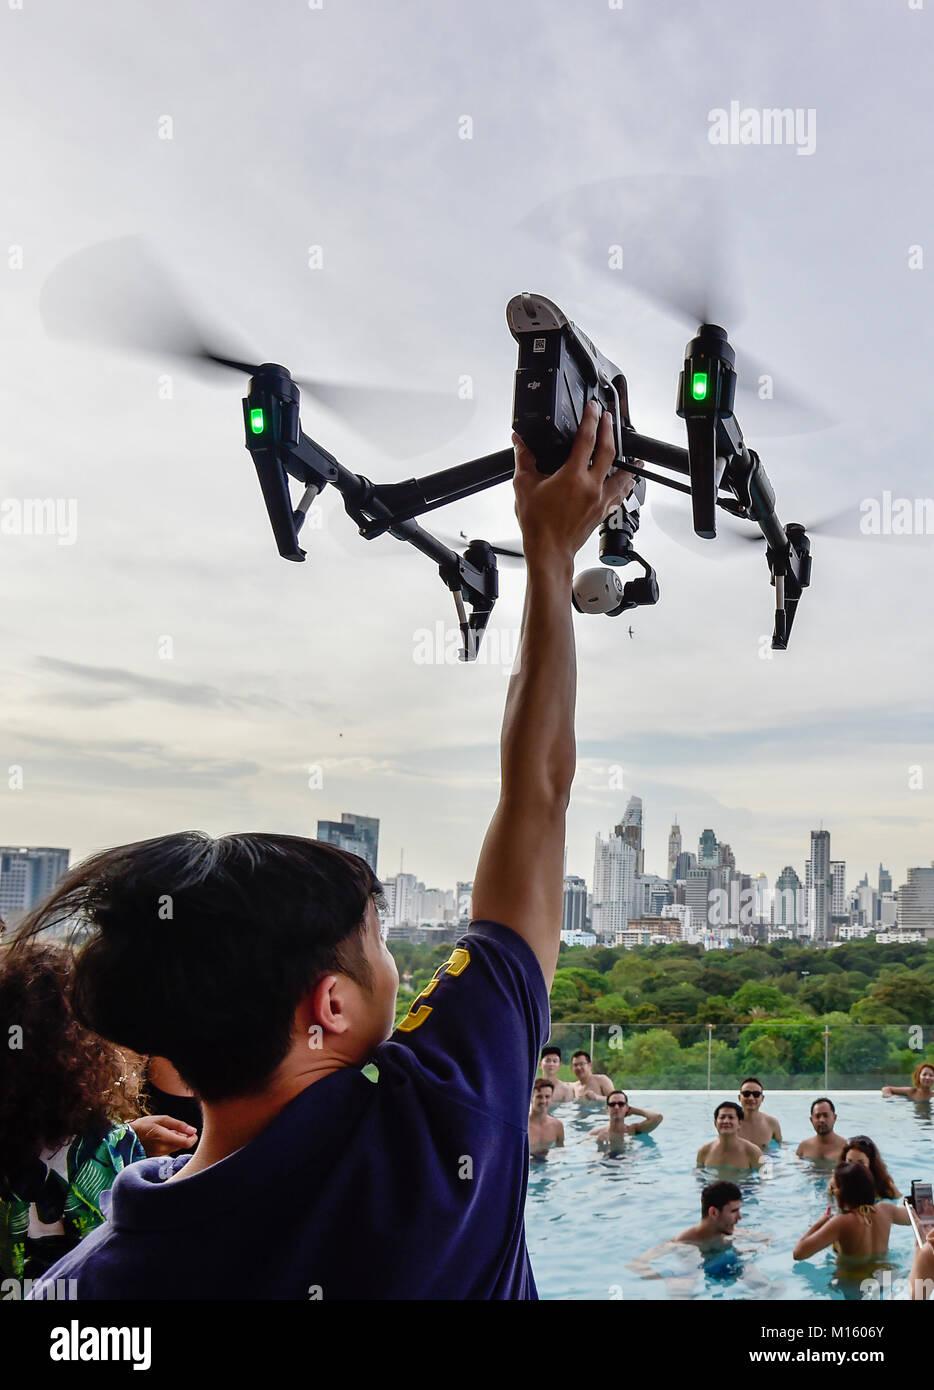 Man launches DJI Inspire 1 drone,Bangkok,Thailand - Stock Image